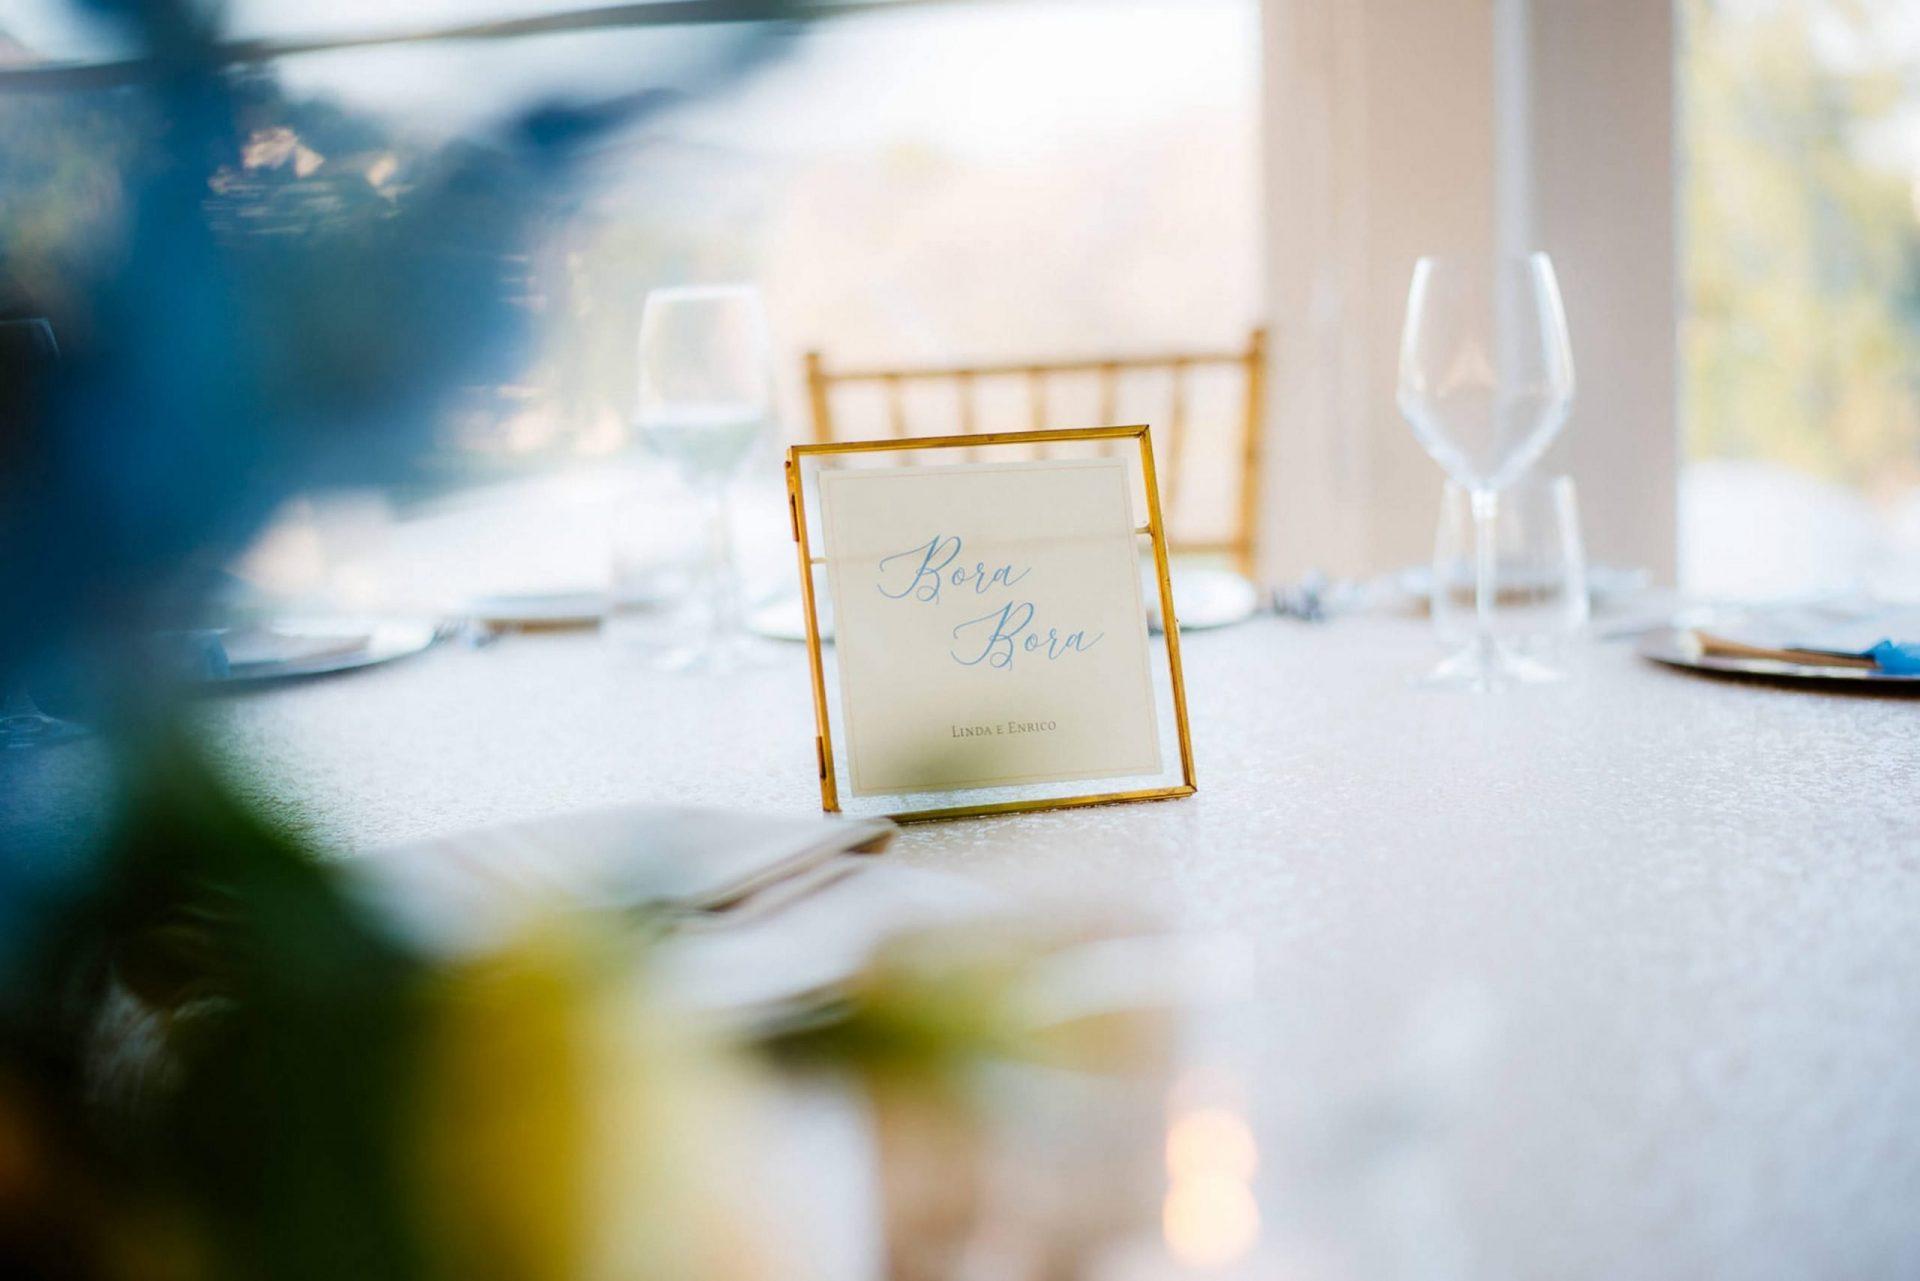 Linda and Enrico, table sign